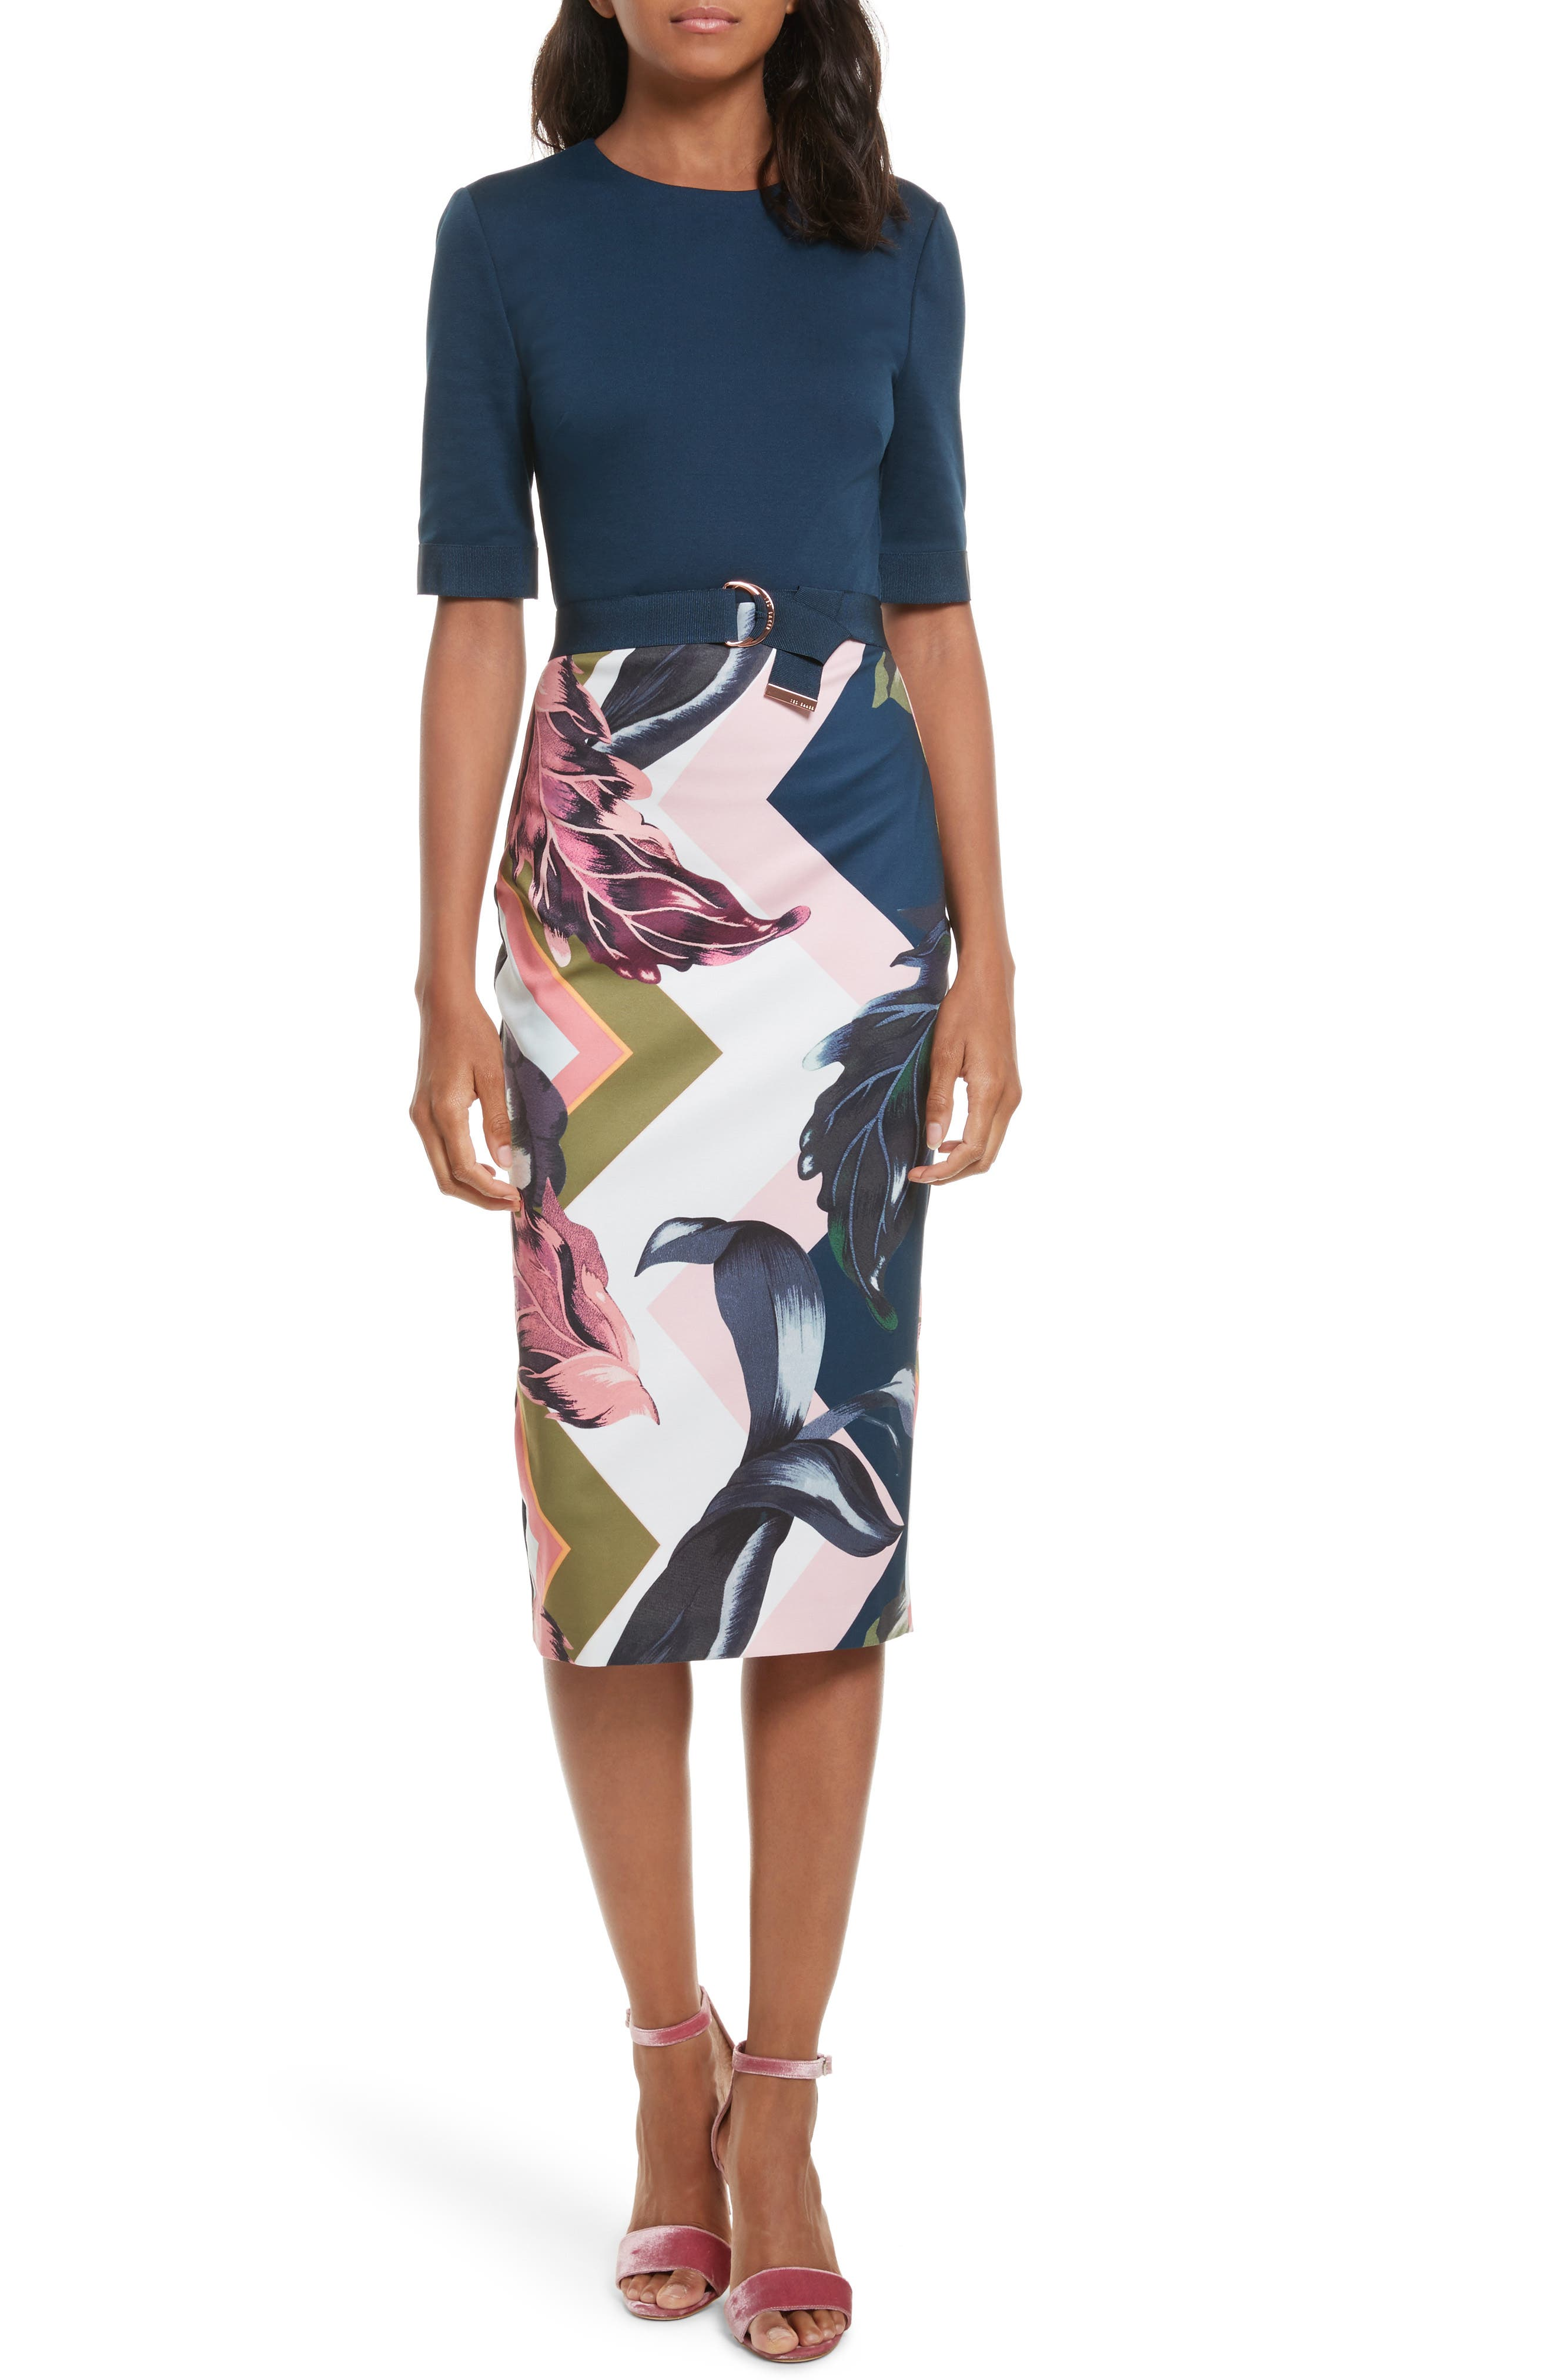 Casiew Eden Body Con Dress,                             Main thumbnail 1, color,                             680